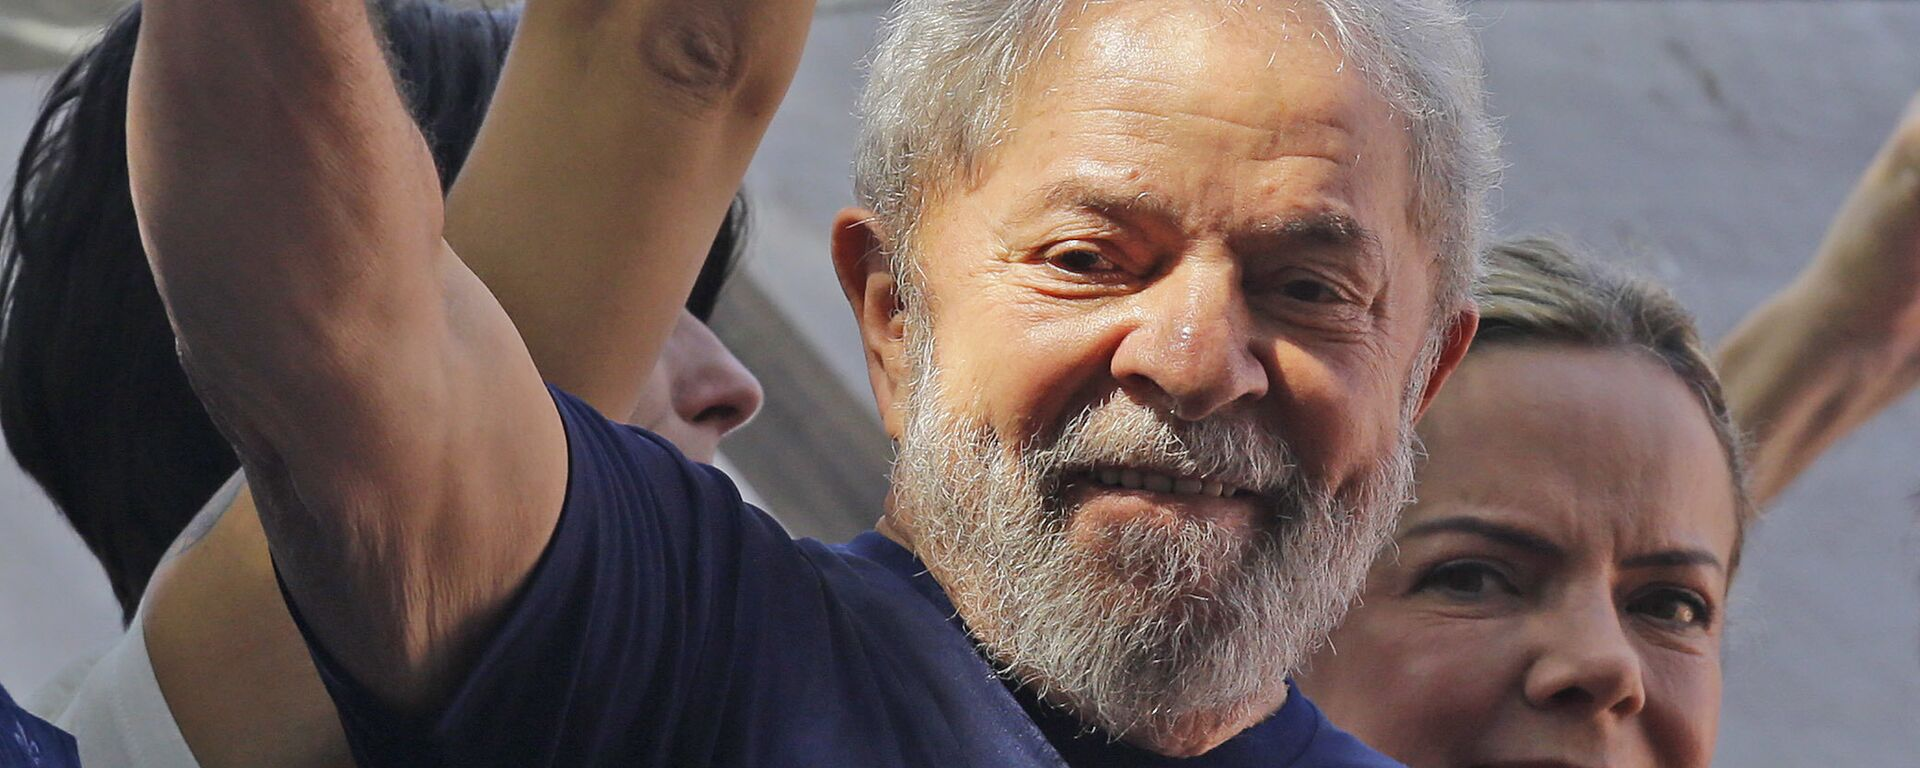 Luiz Inácio Lula da Silva, expresidente de Brasil  - Sputnik Mundo, 1920, 17.08.2021